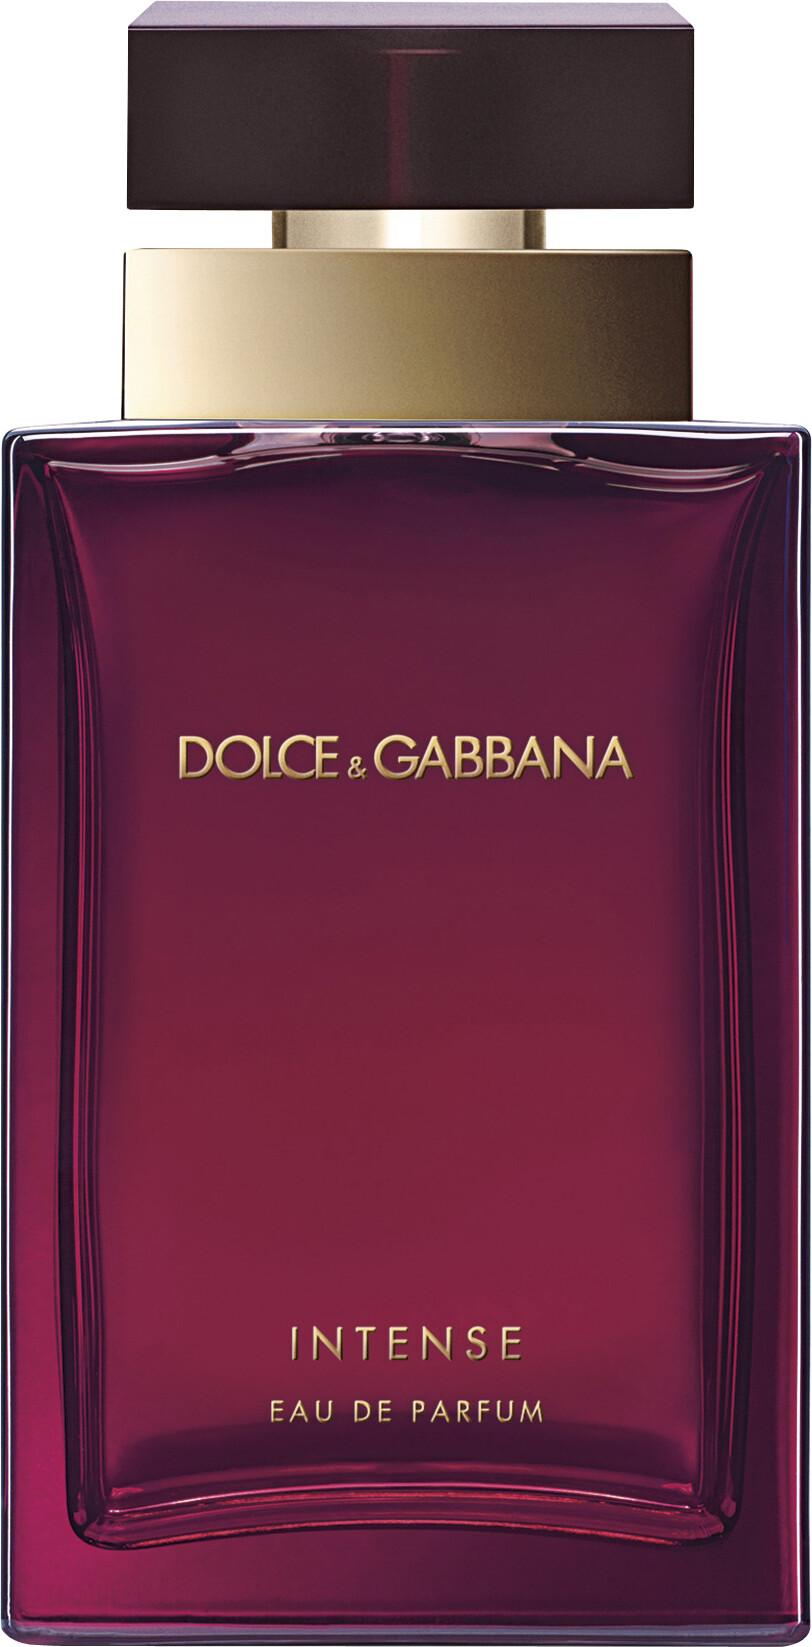 3f8a22db440a88 ... Dolce   Gabbana Pour Femme Intense Eau de Parfum Spray 50ml ...